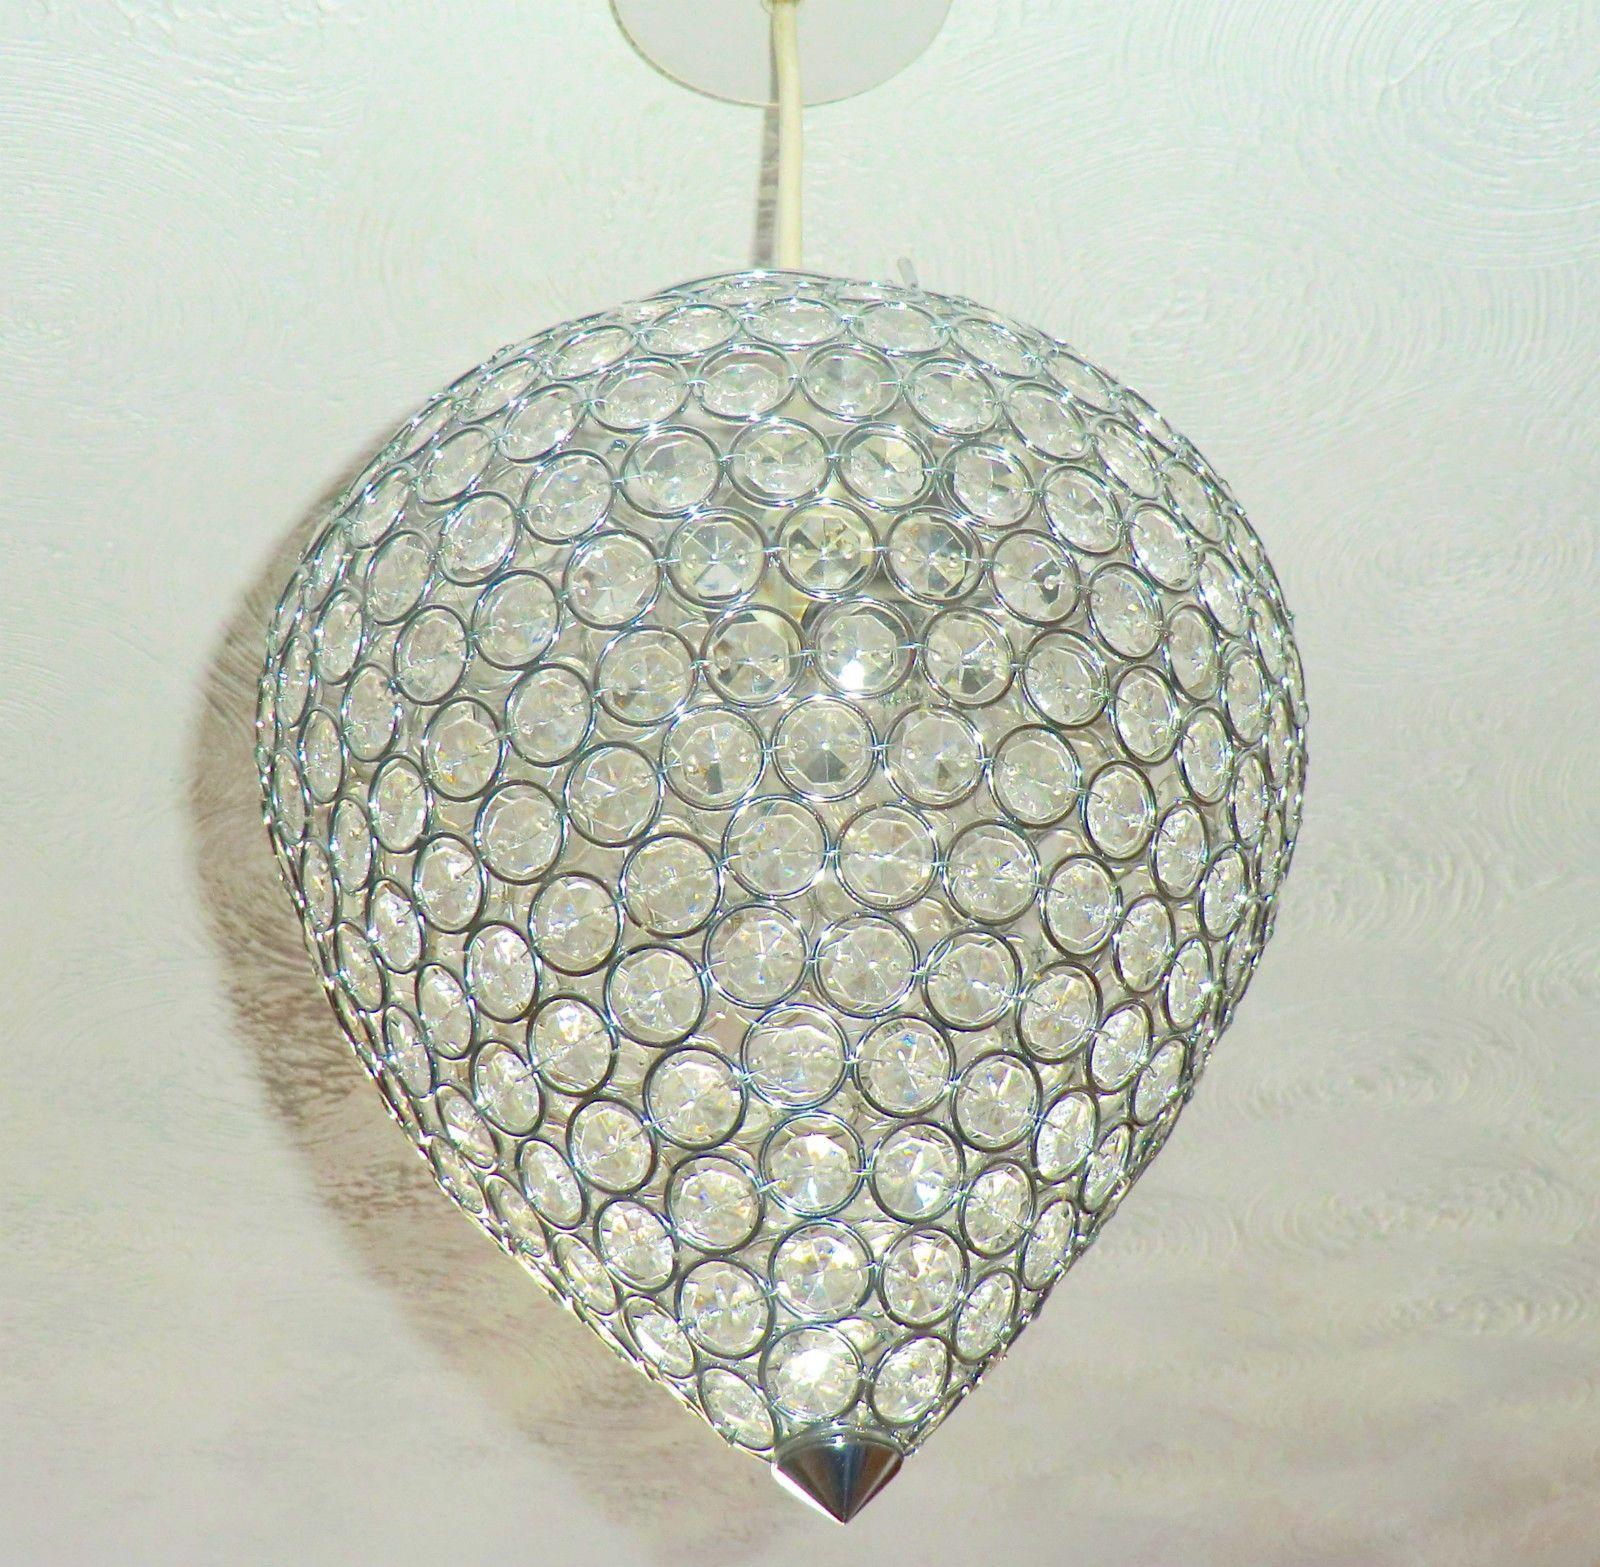 Moroccan style fish tail chandelier pendant light chic lantern ...